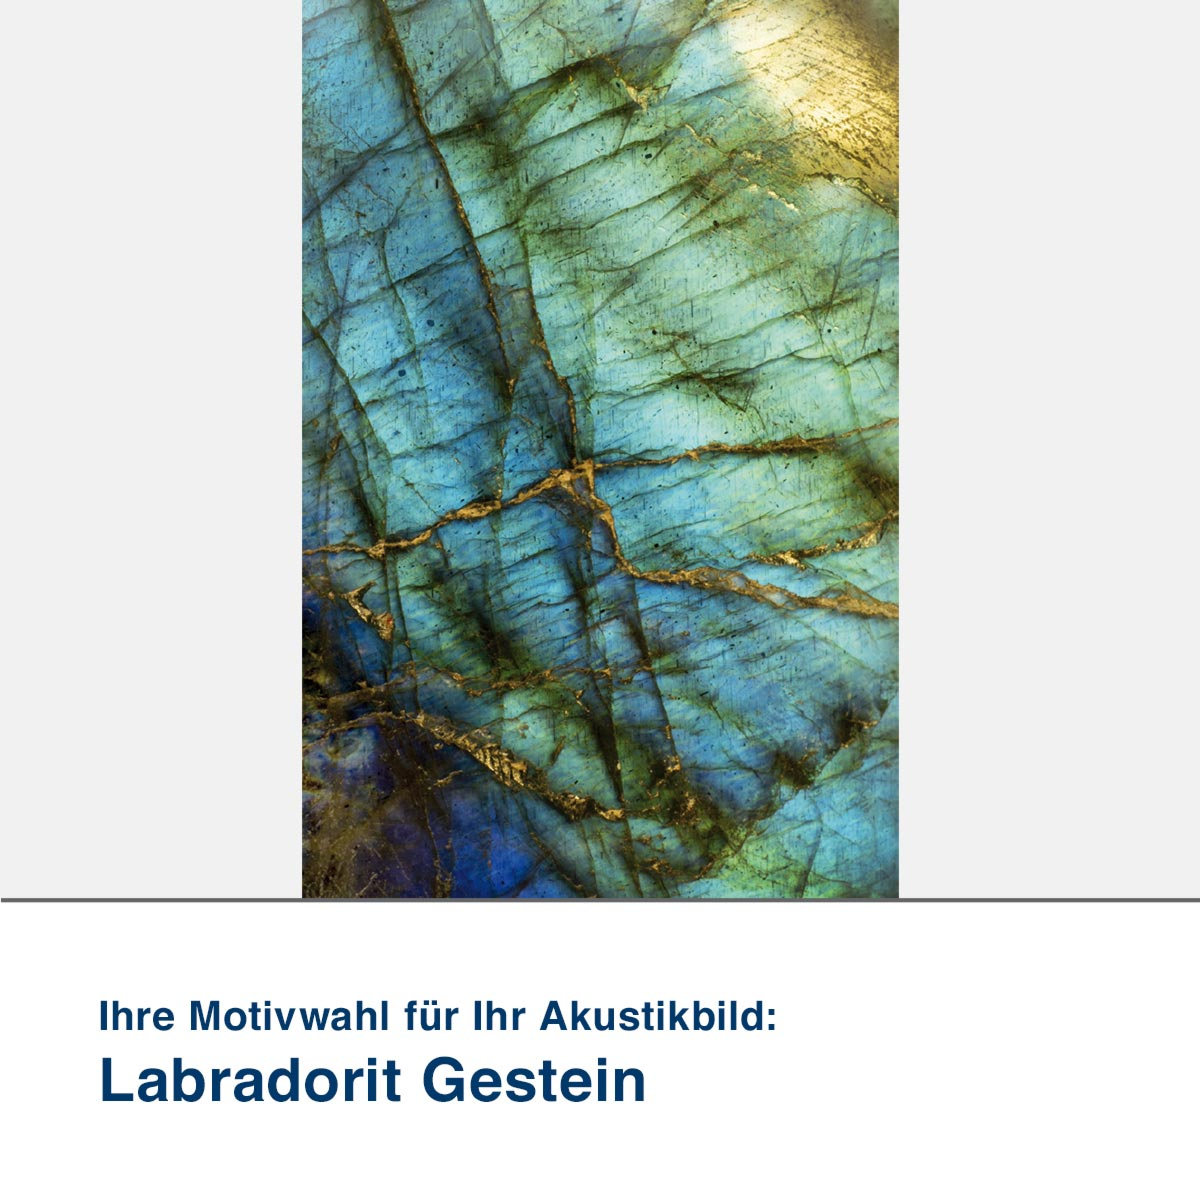 Akustikbild Motiv Labradorit Gestein